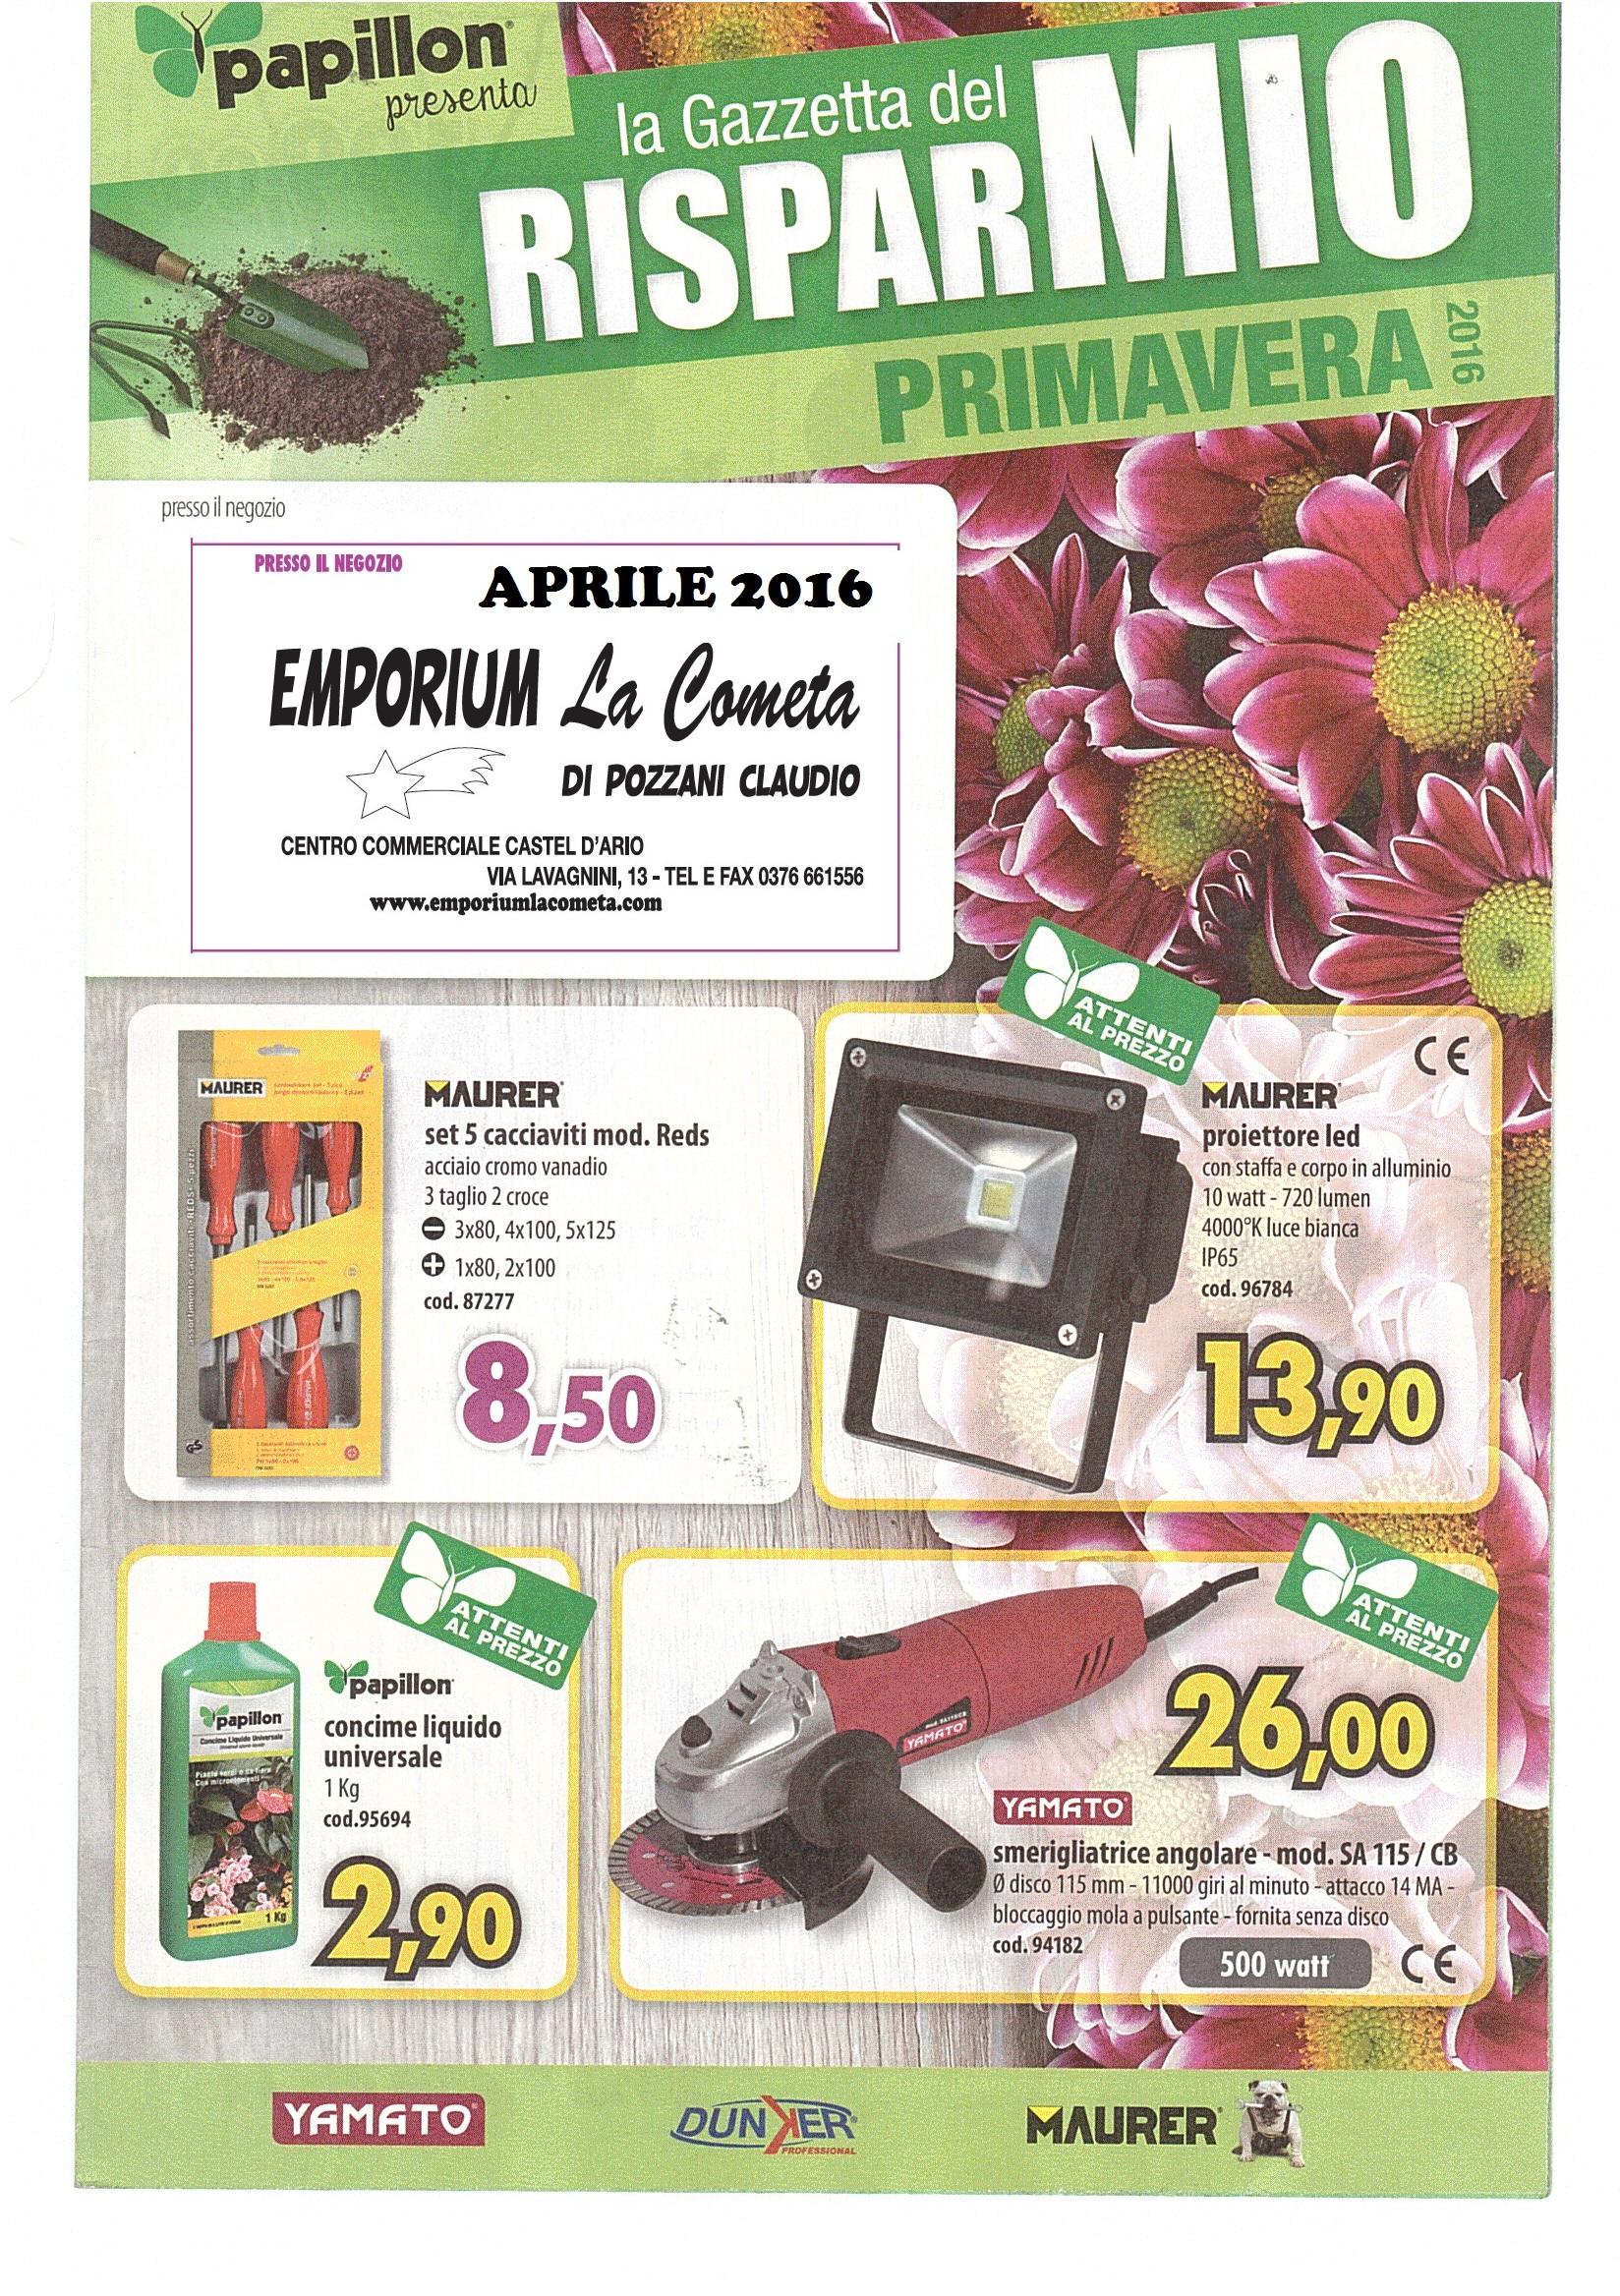 gazzetta-del-risparmio-primavera-2016-pag-1.jpg